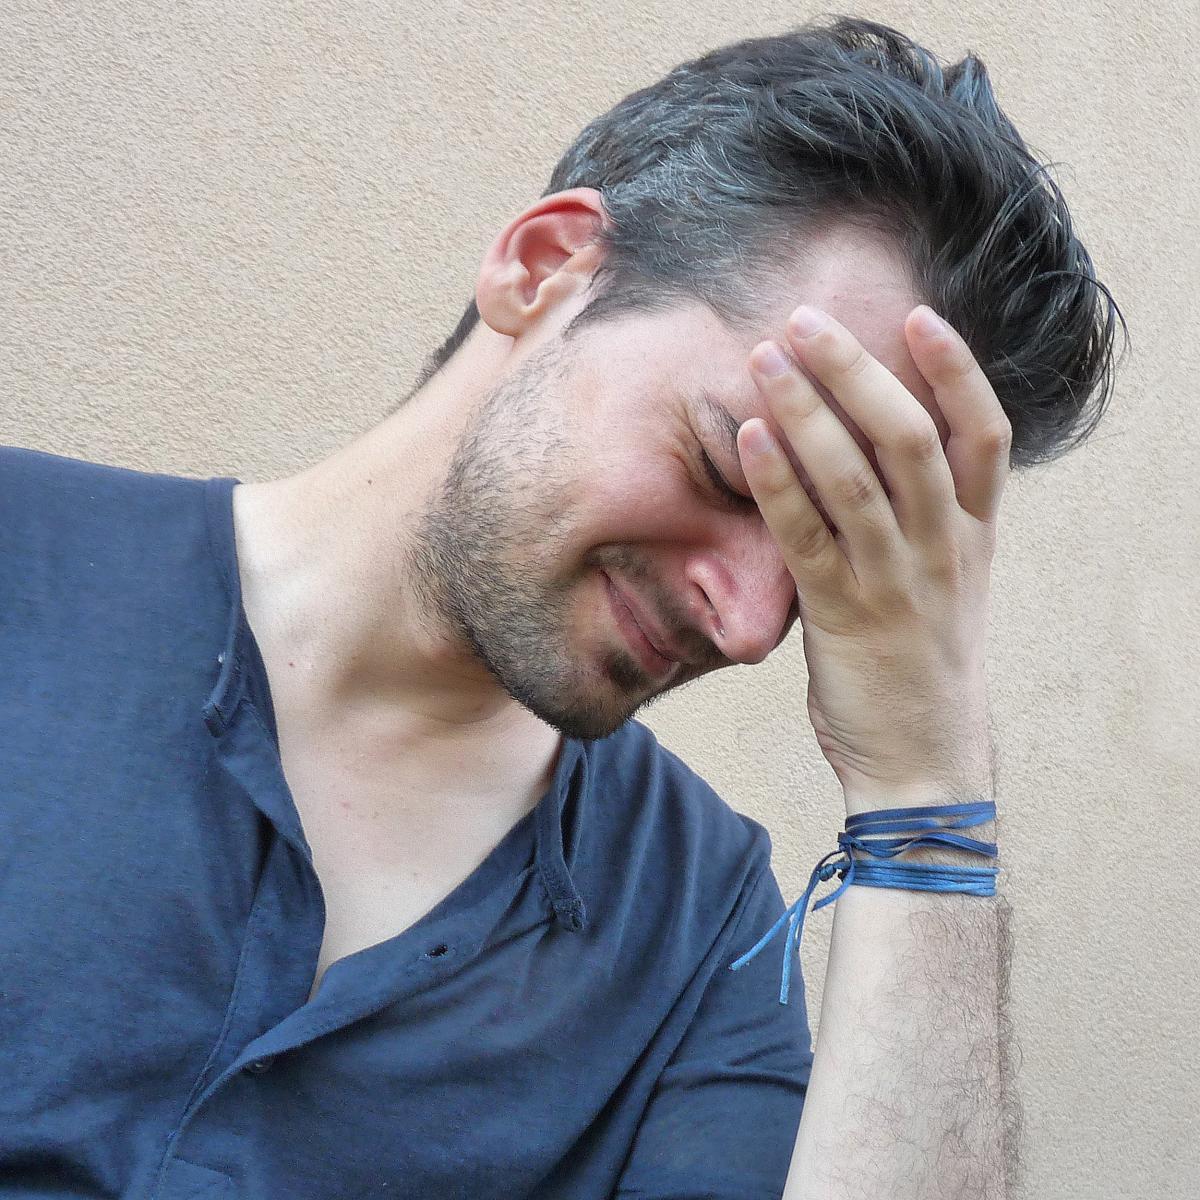 Headache image man person #85180